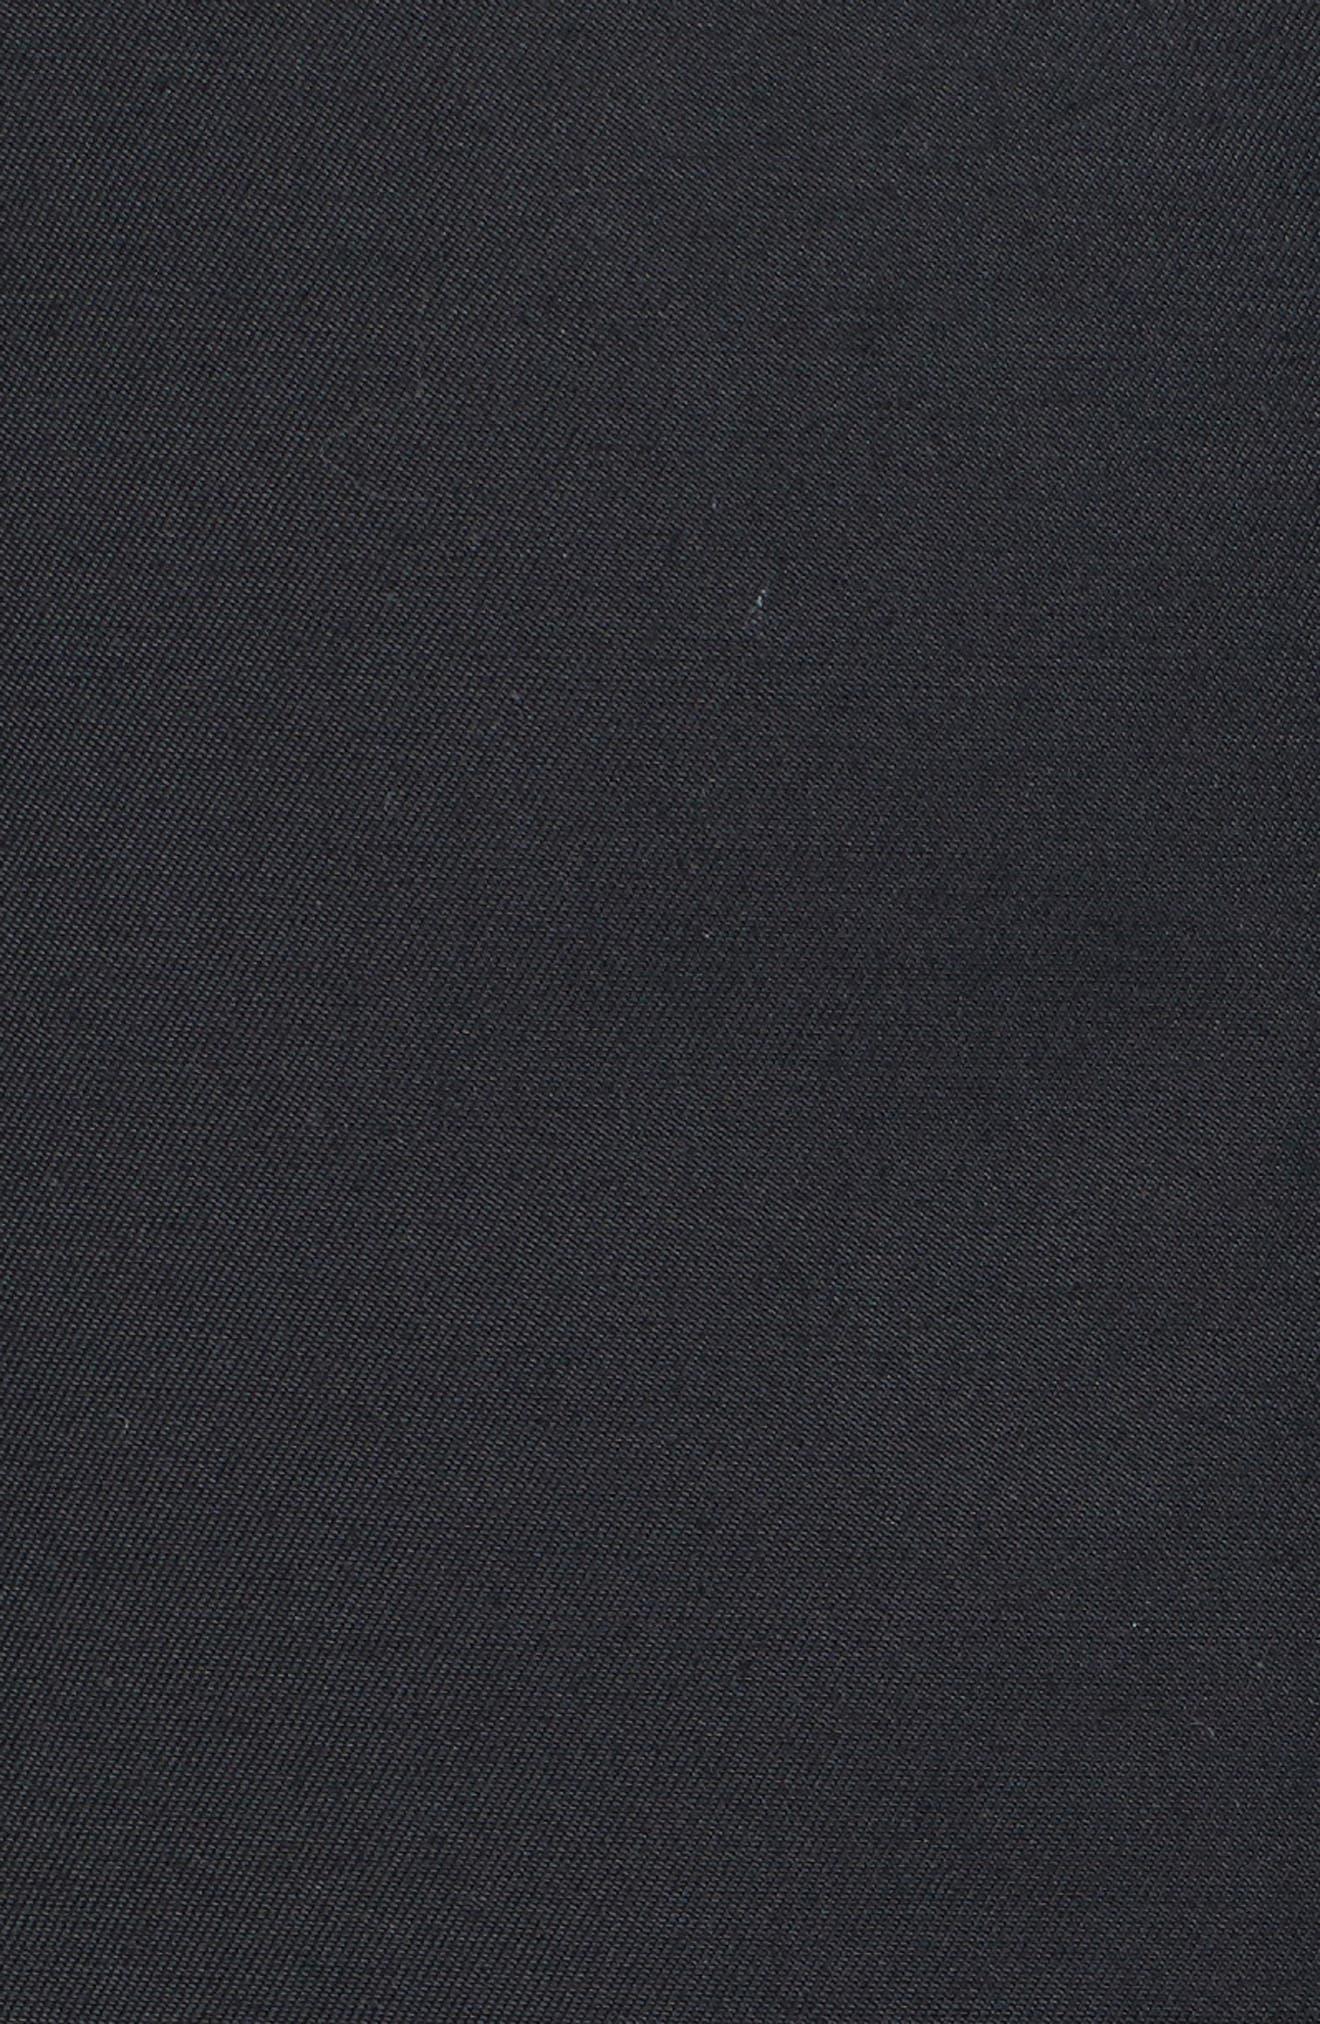 Down Hooded Anorak with Genuine Fox & Rabbit Fur Trim,                             Alternate thumbnail 6, color,                             Black